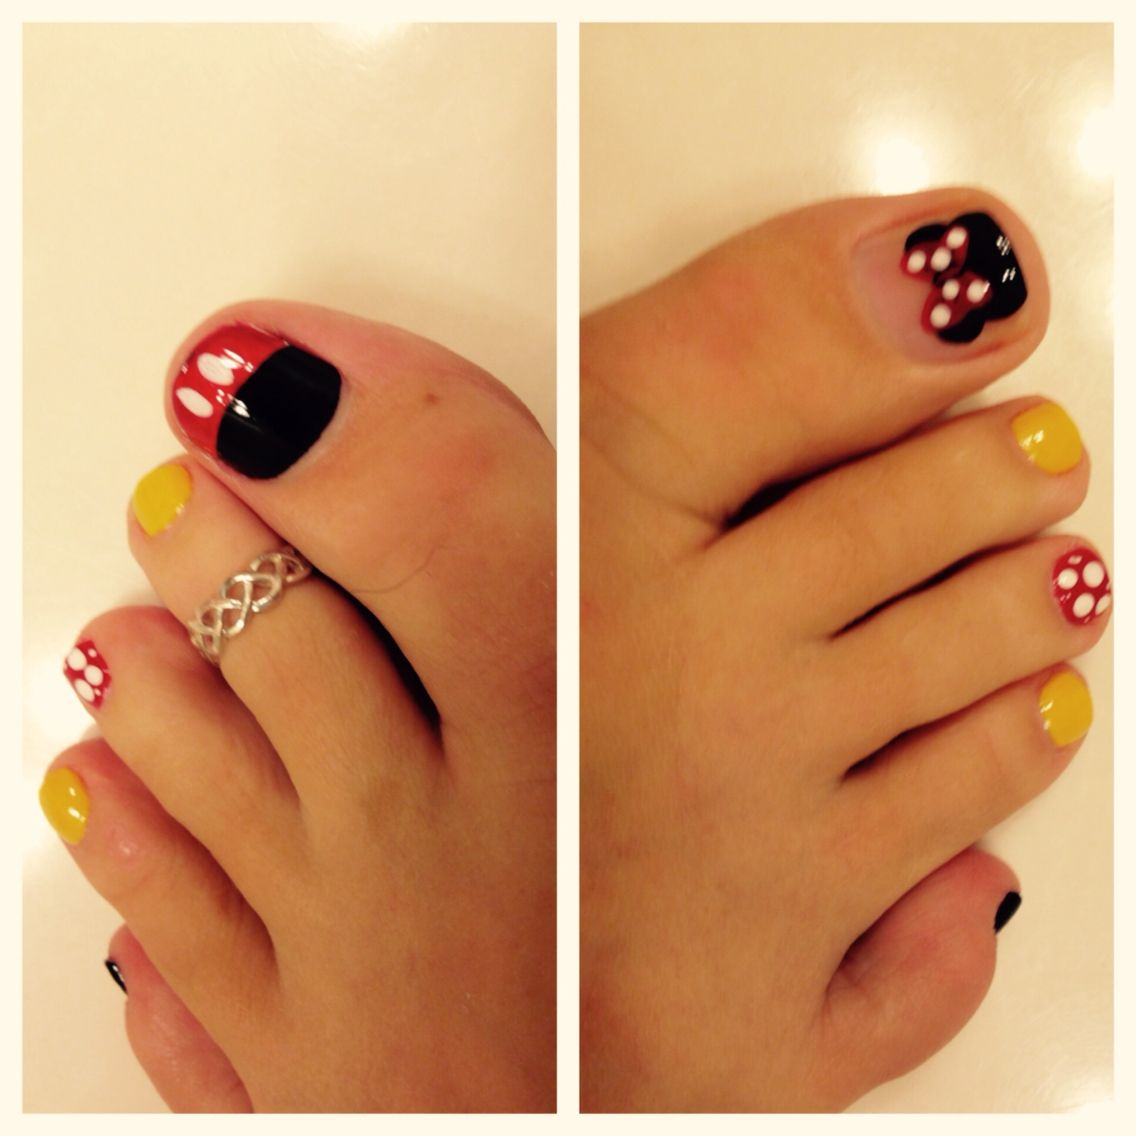 Disney Pedicure - Mickey Mouse Toe Nail Designs Minnie Mouse Toe Nail Designs